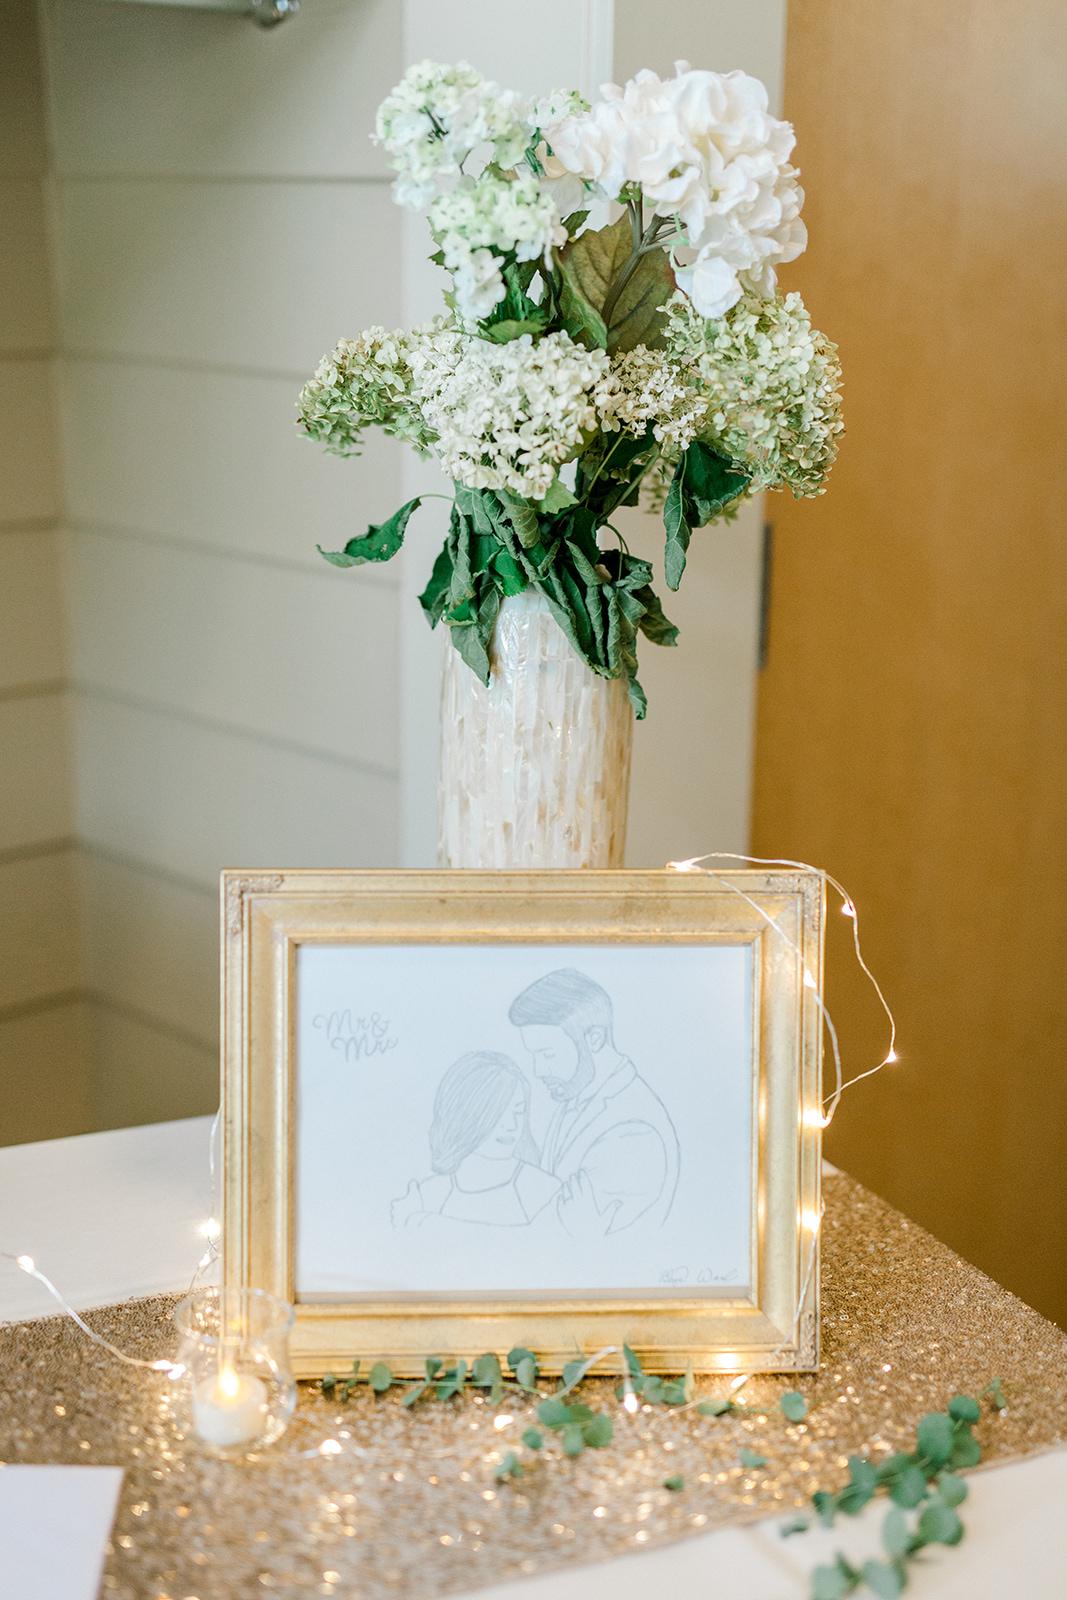 Ushers_Ferry_Cedar_Rapids_Wedding_Ella+Phil-2065.jpg